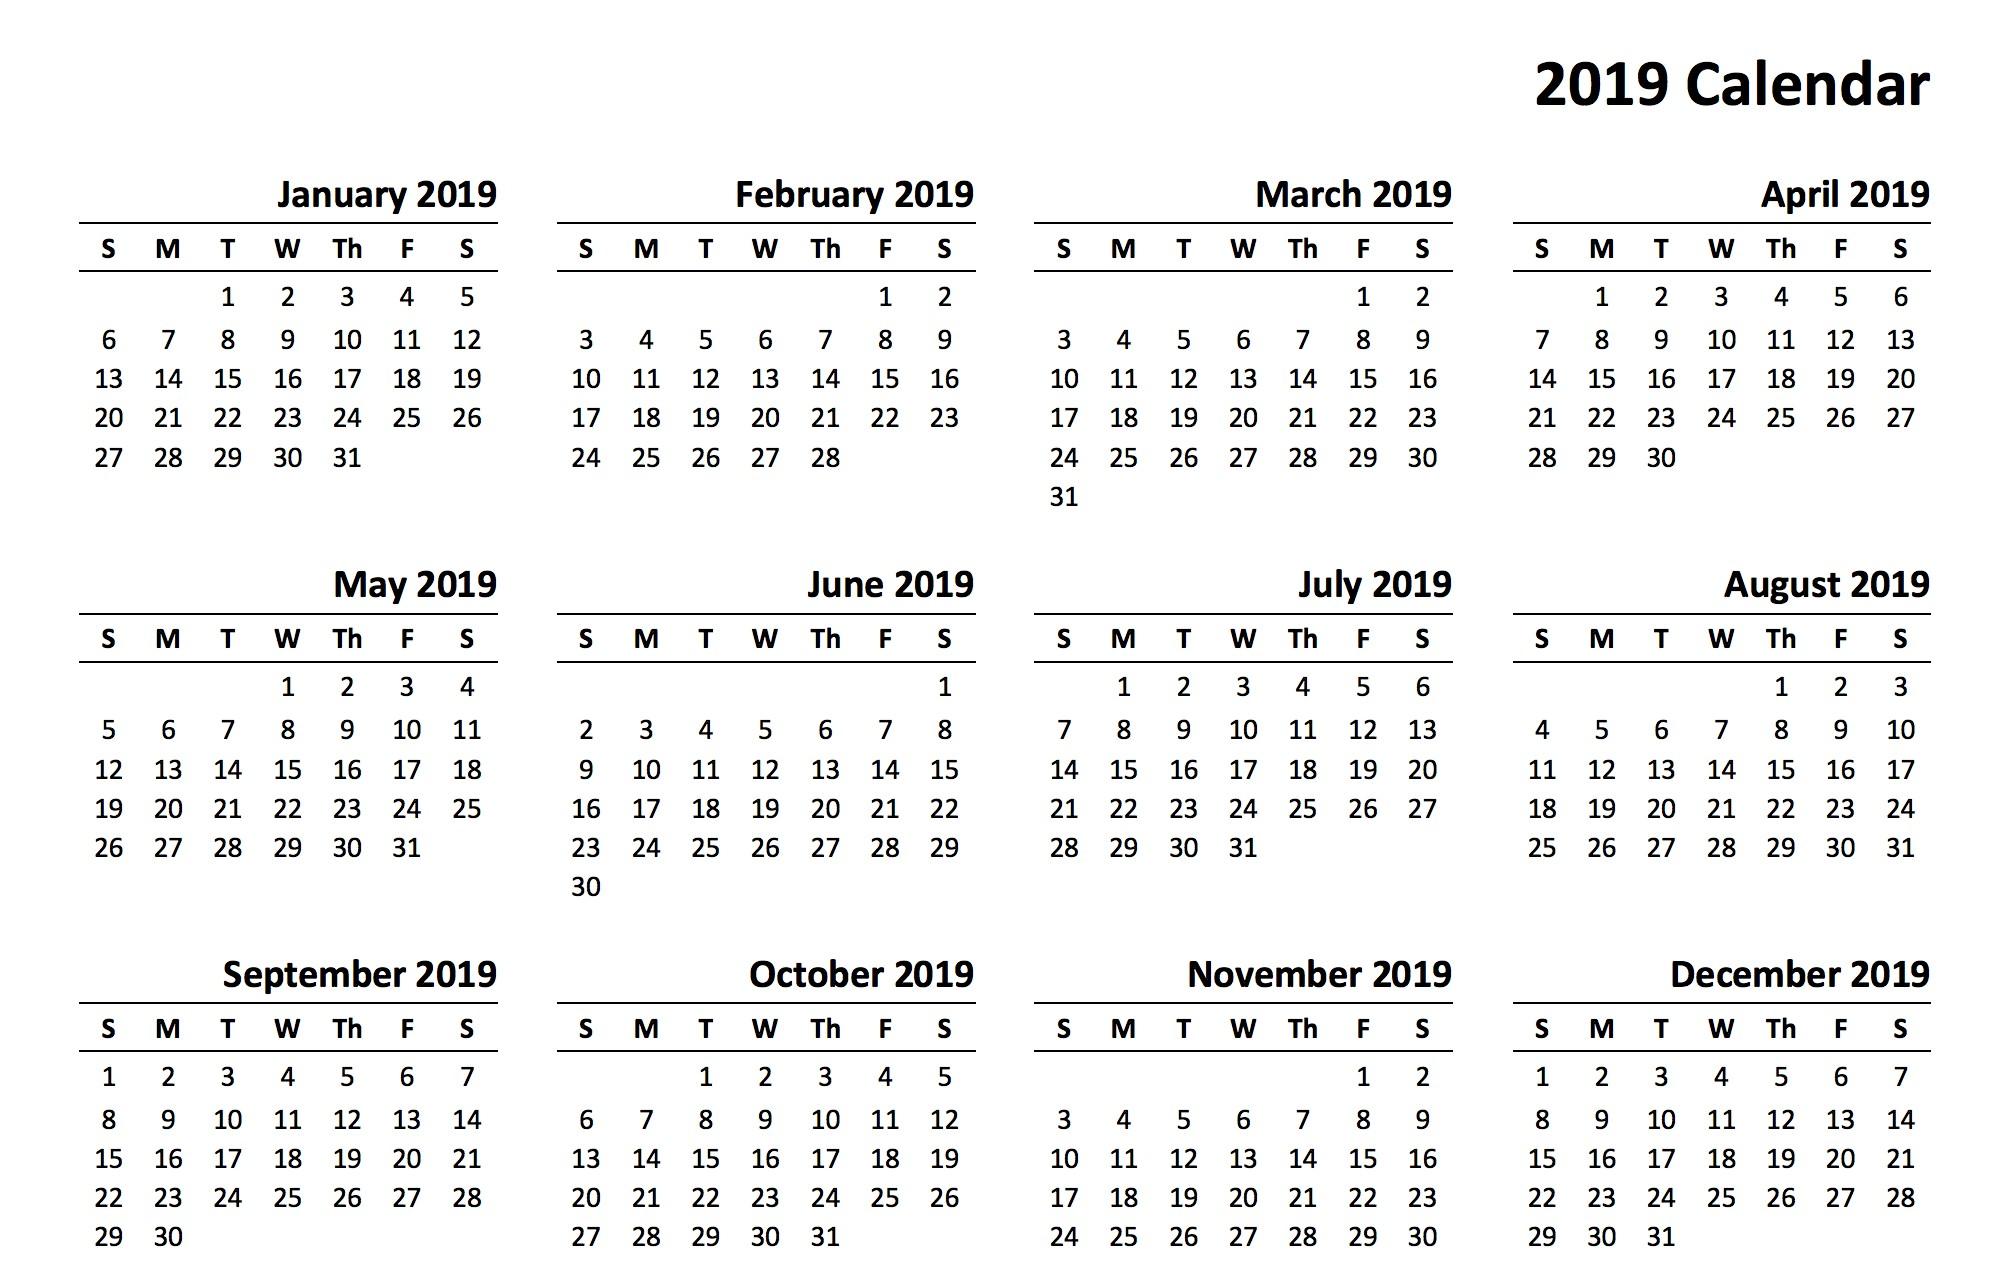 Blank Calendar 2019 Excel Más Arriba-a-fecha 12 Month Calendar 2019 Printable Of Blank Calendar 2019 Excel Más Recientes Collecting 2019 Calendar Excel Hk Calendar Free Printable